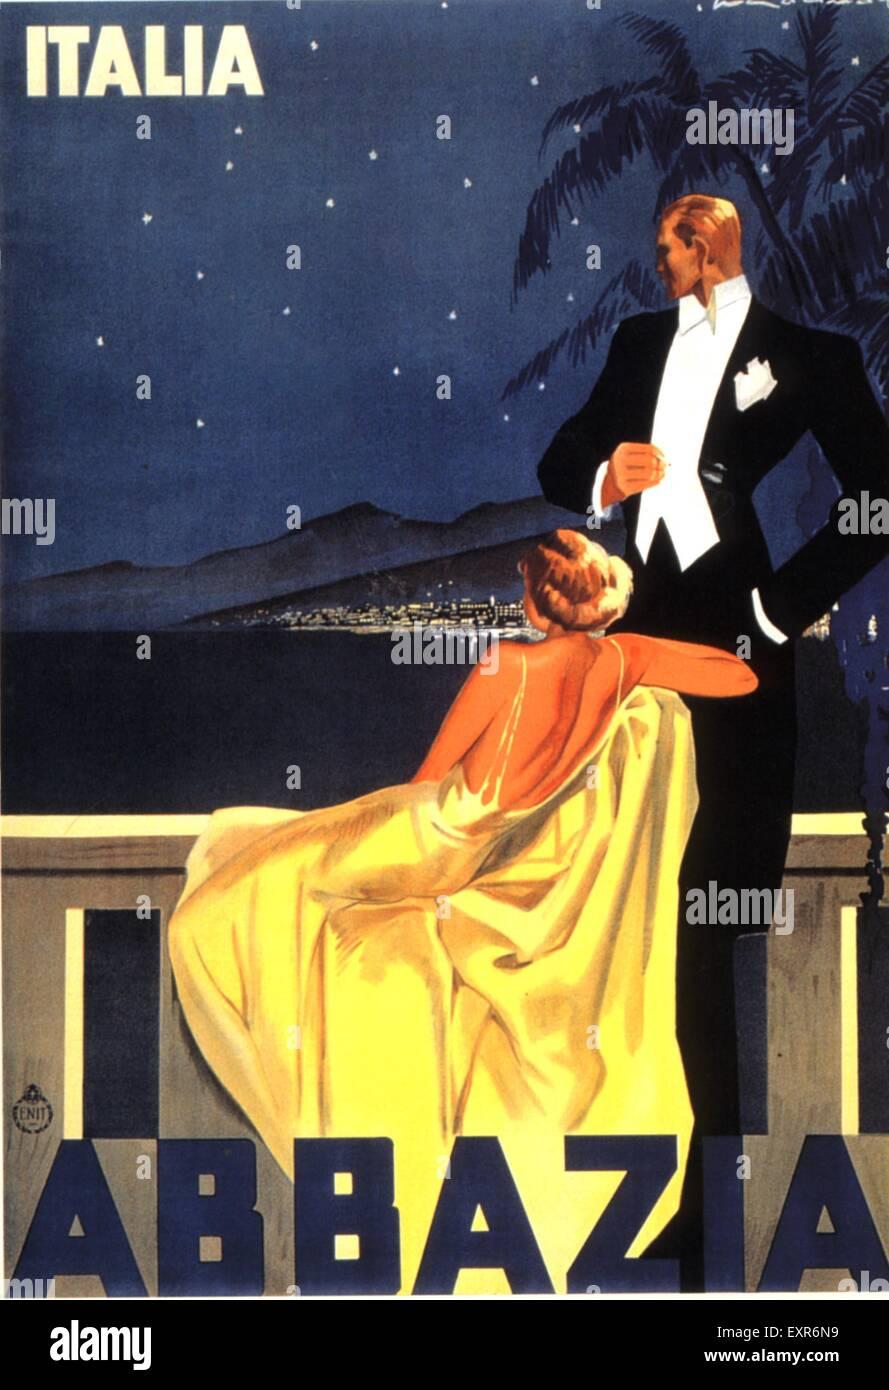 1930s Italy Abbazia Poster Stock Photo